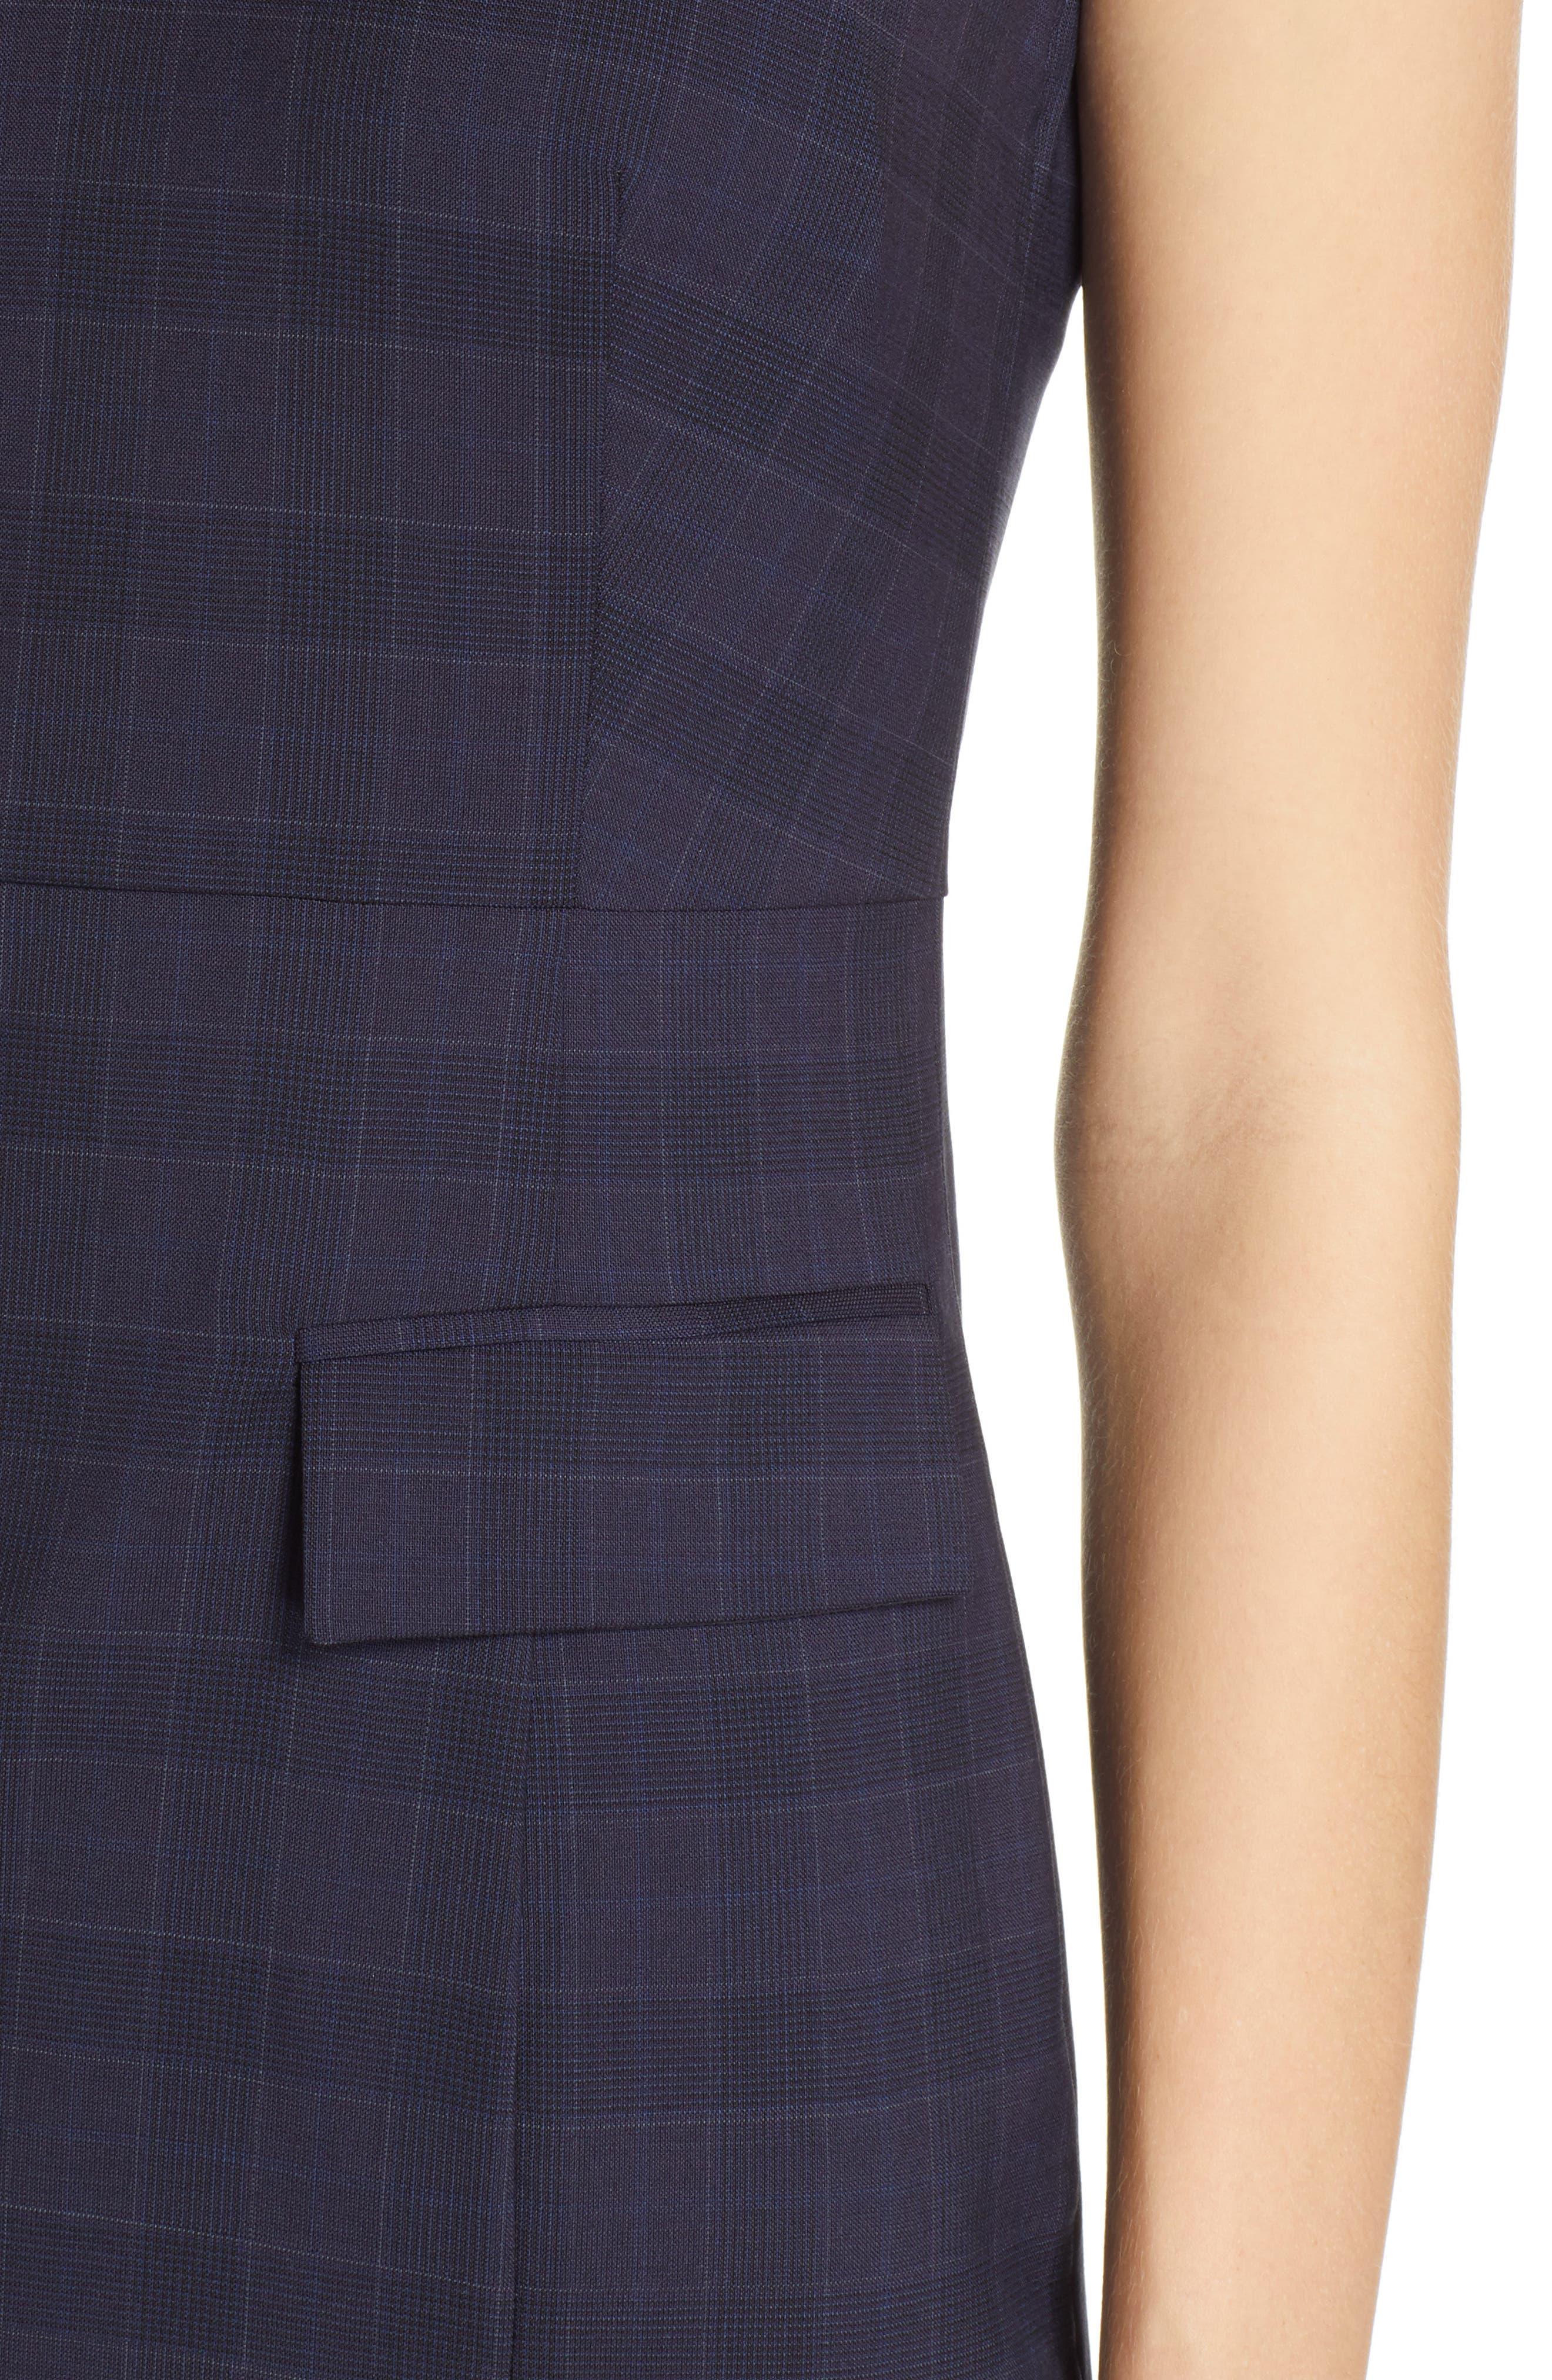 BOSS, Docanes Modern Check Wool Dress, Alternate thumbnail 5, color, DARK NAVY FANTASY